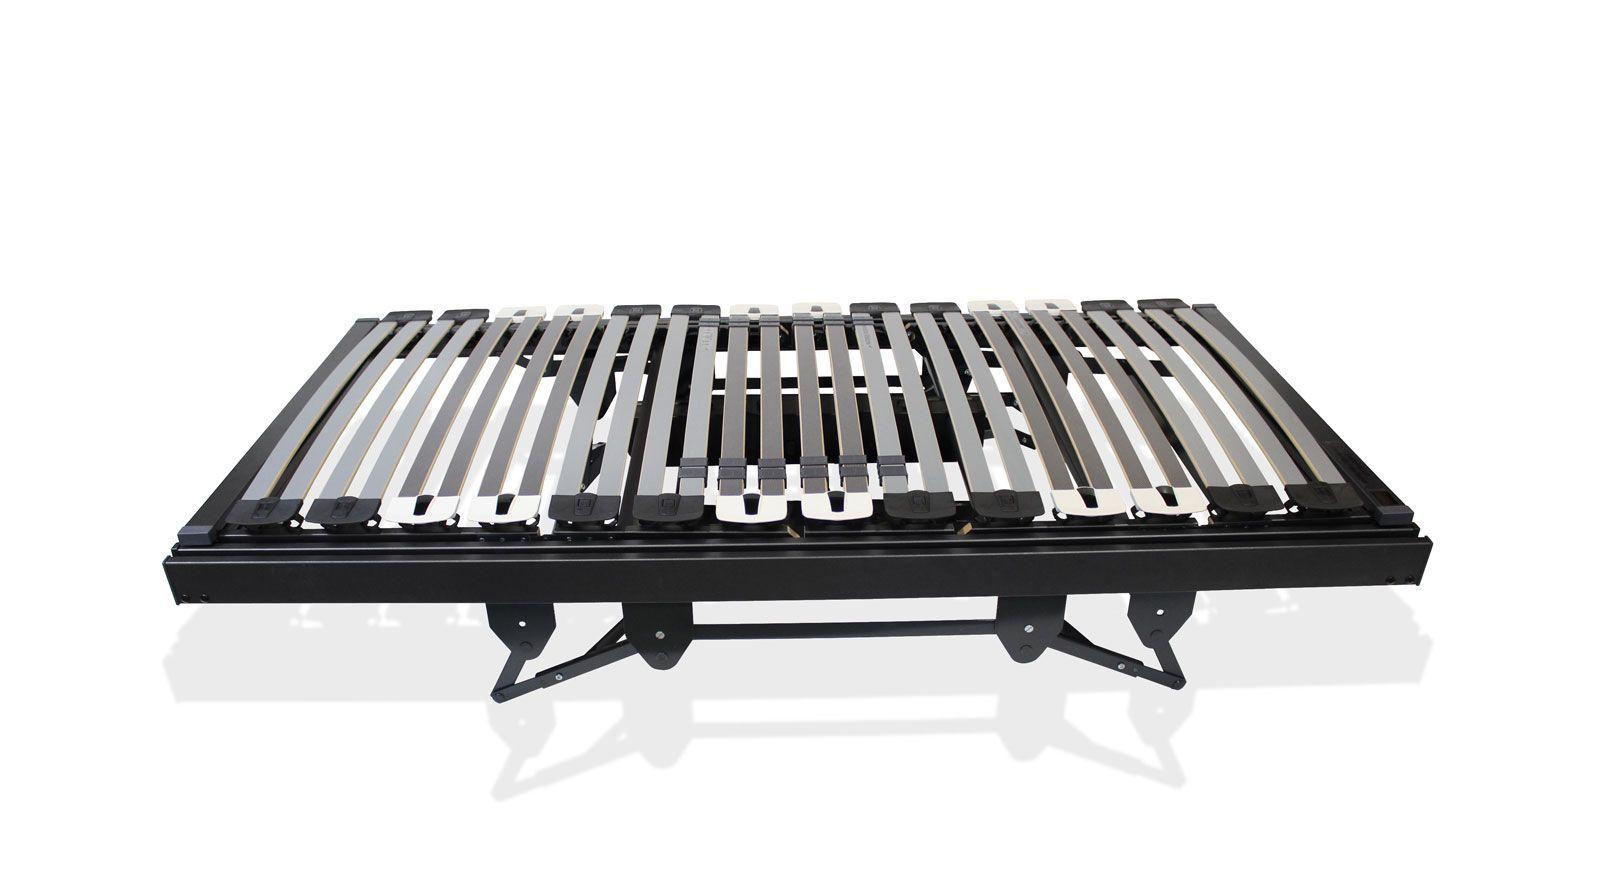 Lattenrost orthowell liftflex motor stabil und hochwertig